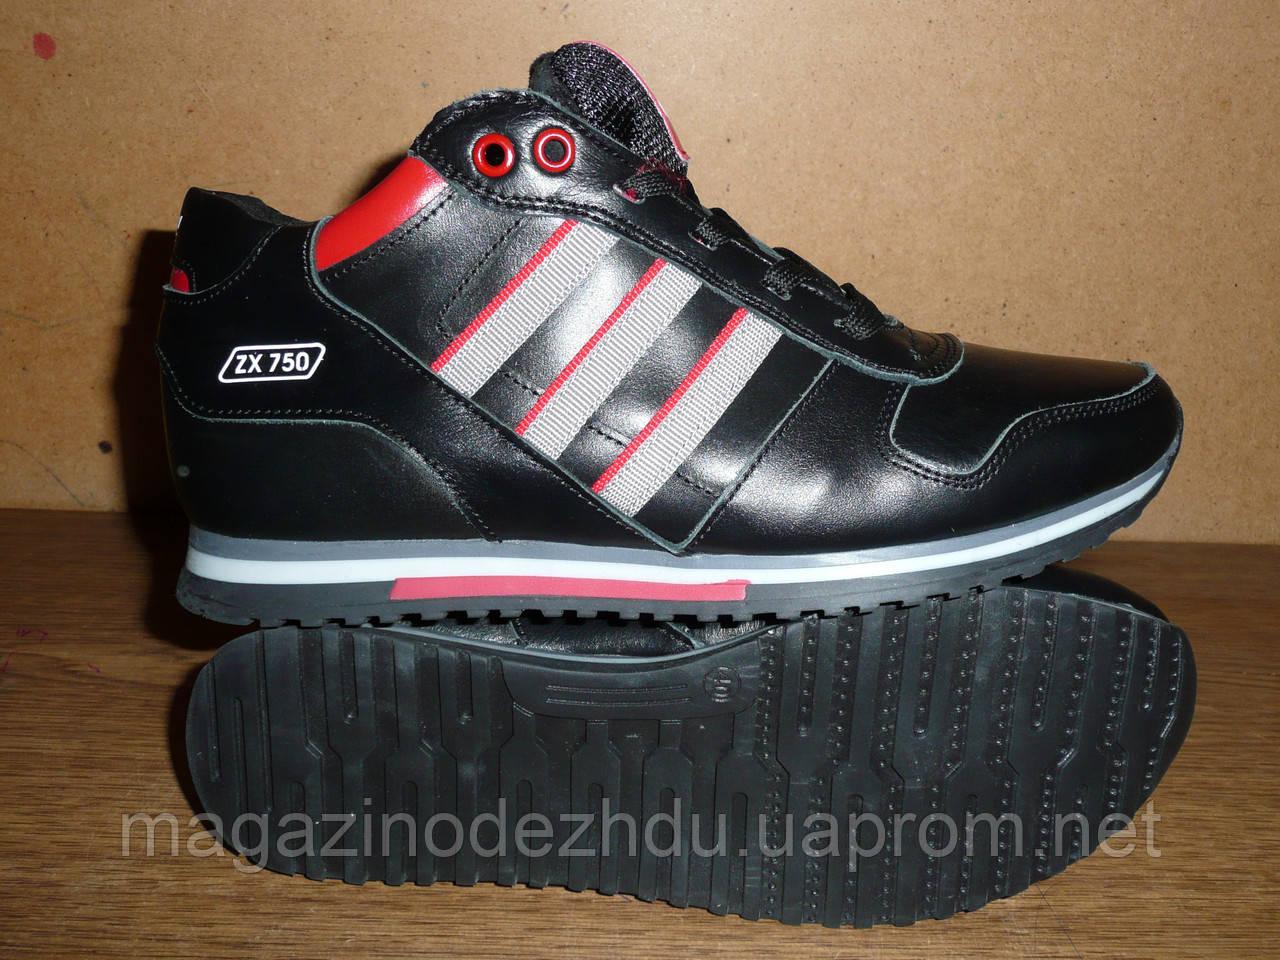 a65aae325e64 Мужские зимние ботинки Adidas ZX 750 - Интернет магазин